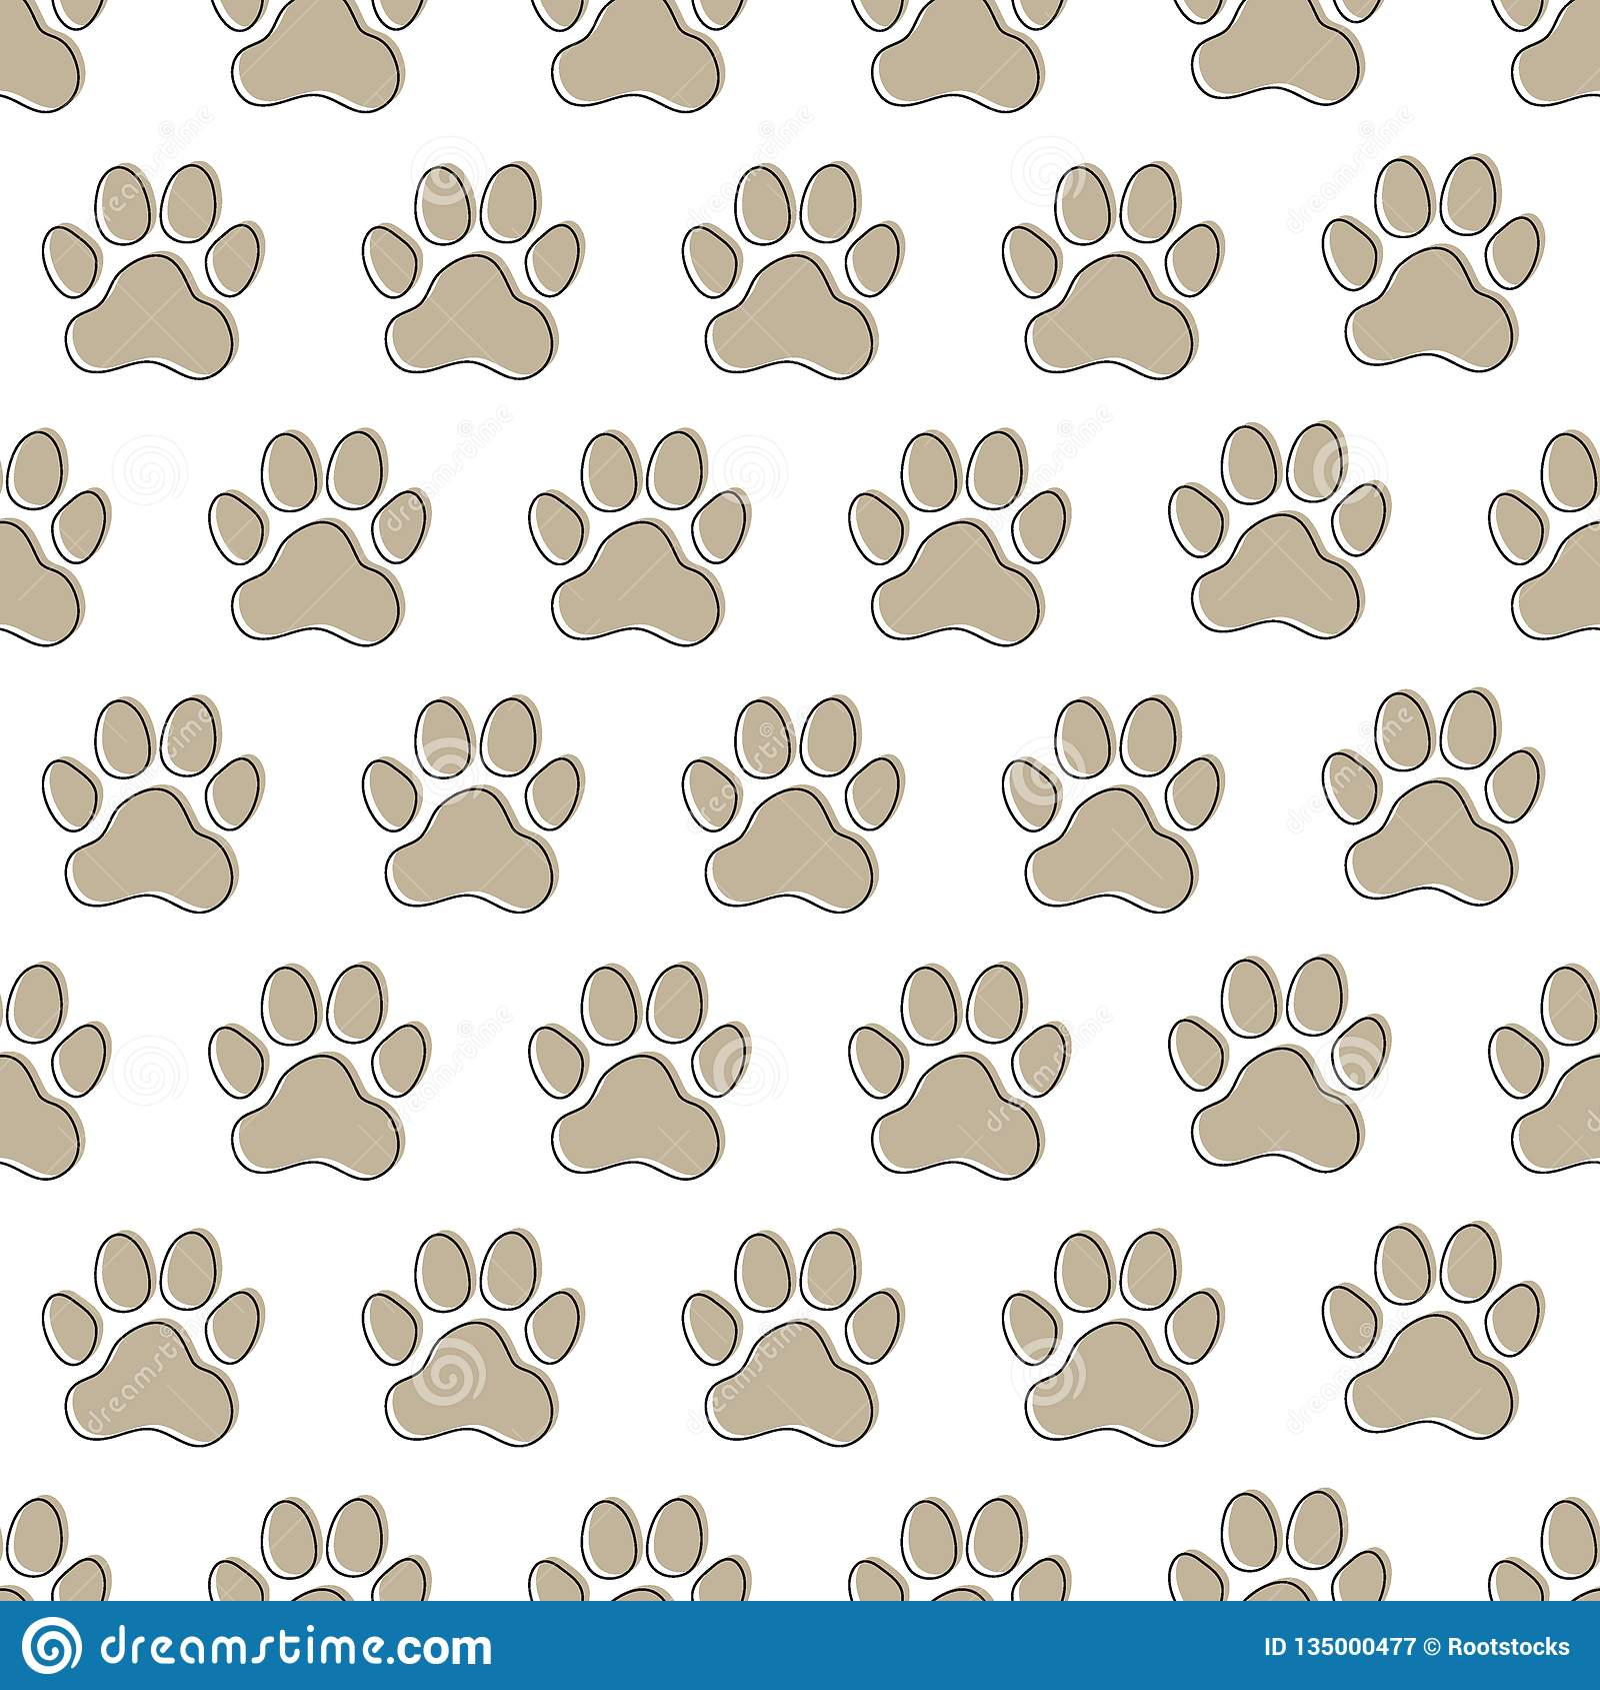 4178d27cb104 Paw prints seamless pattern. Animal dog paws. Vector illustration. More  similar stock illustrations